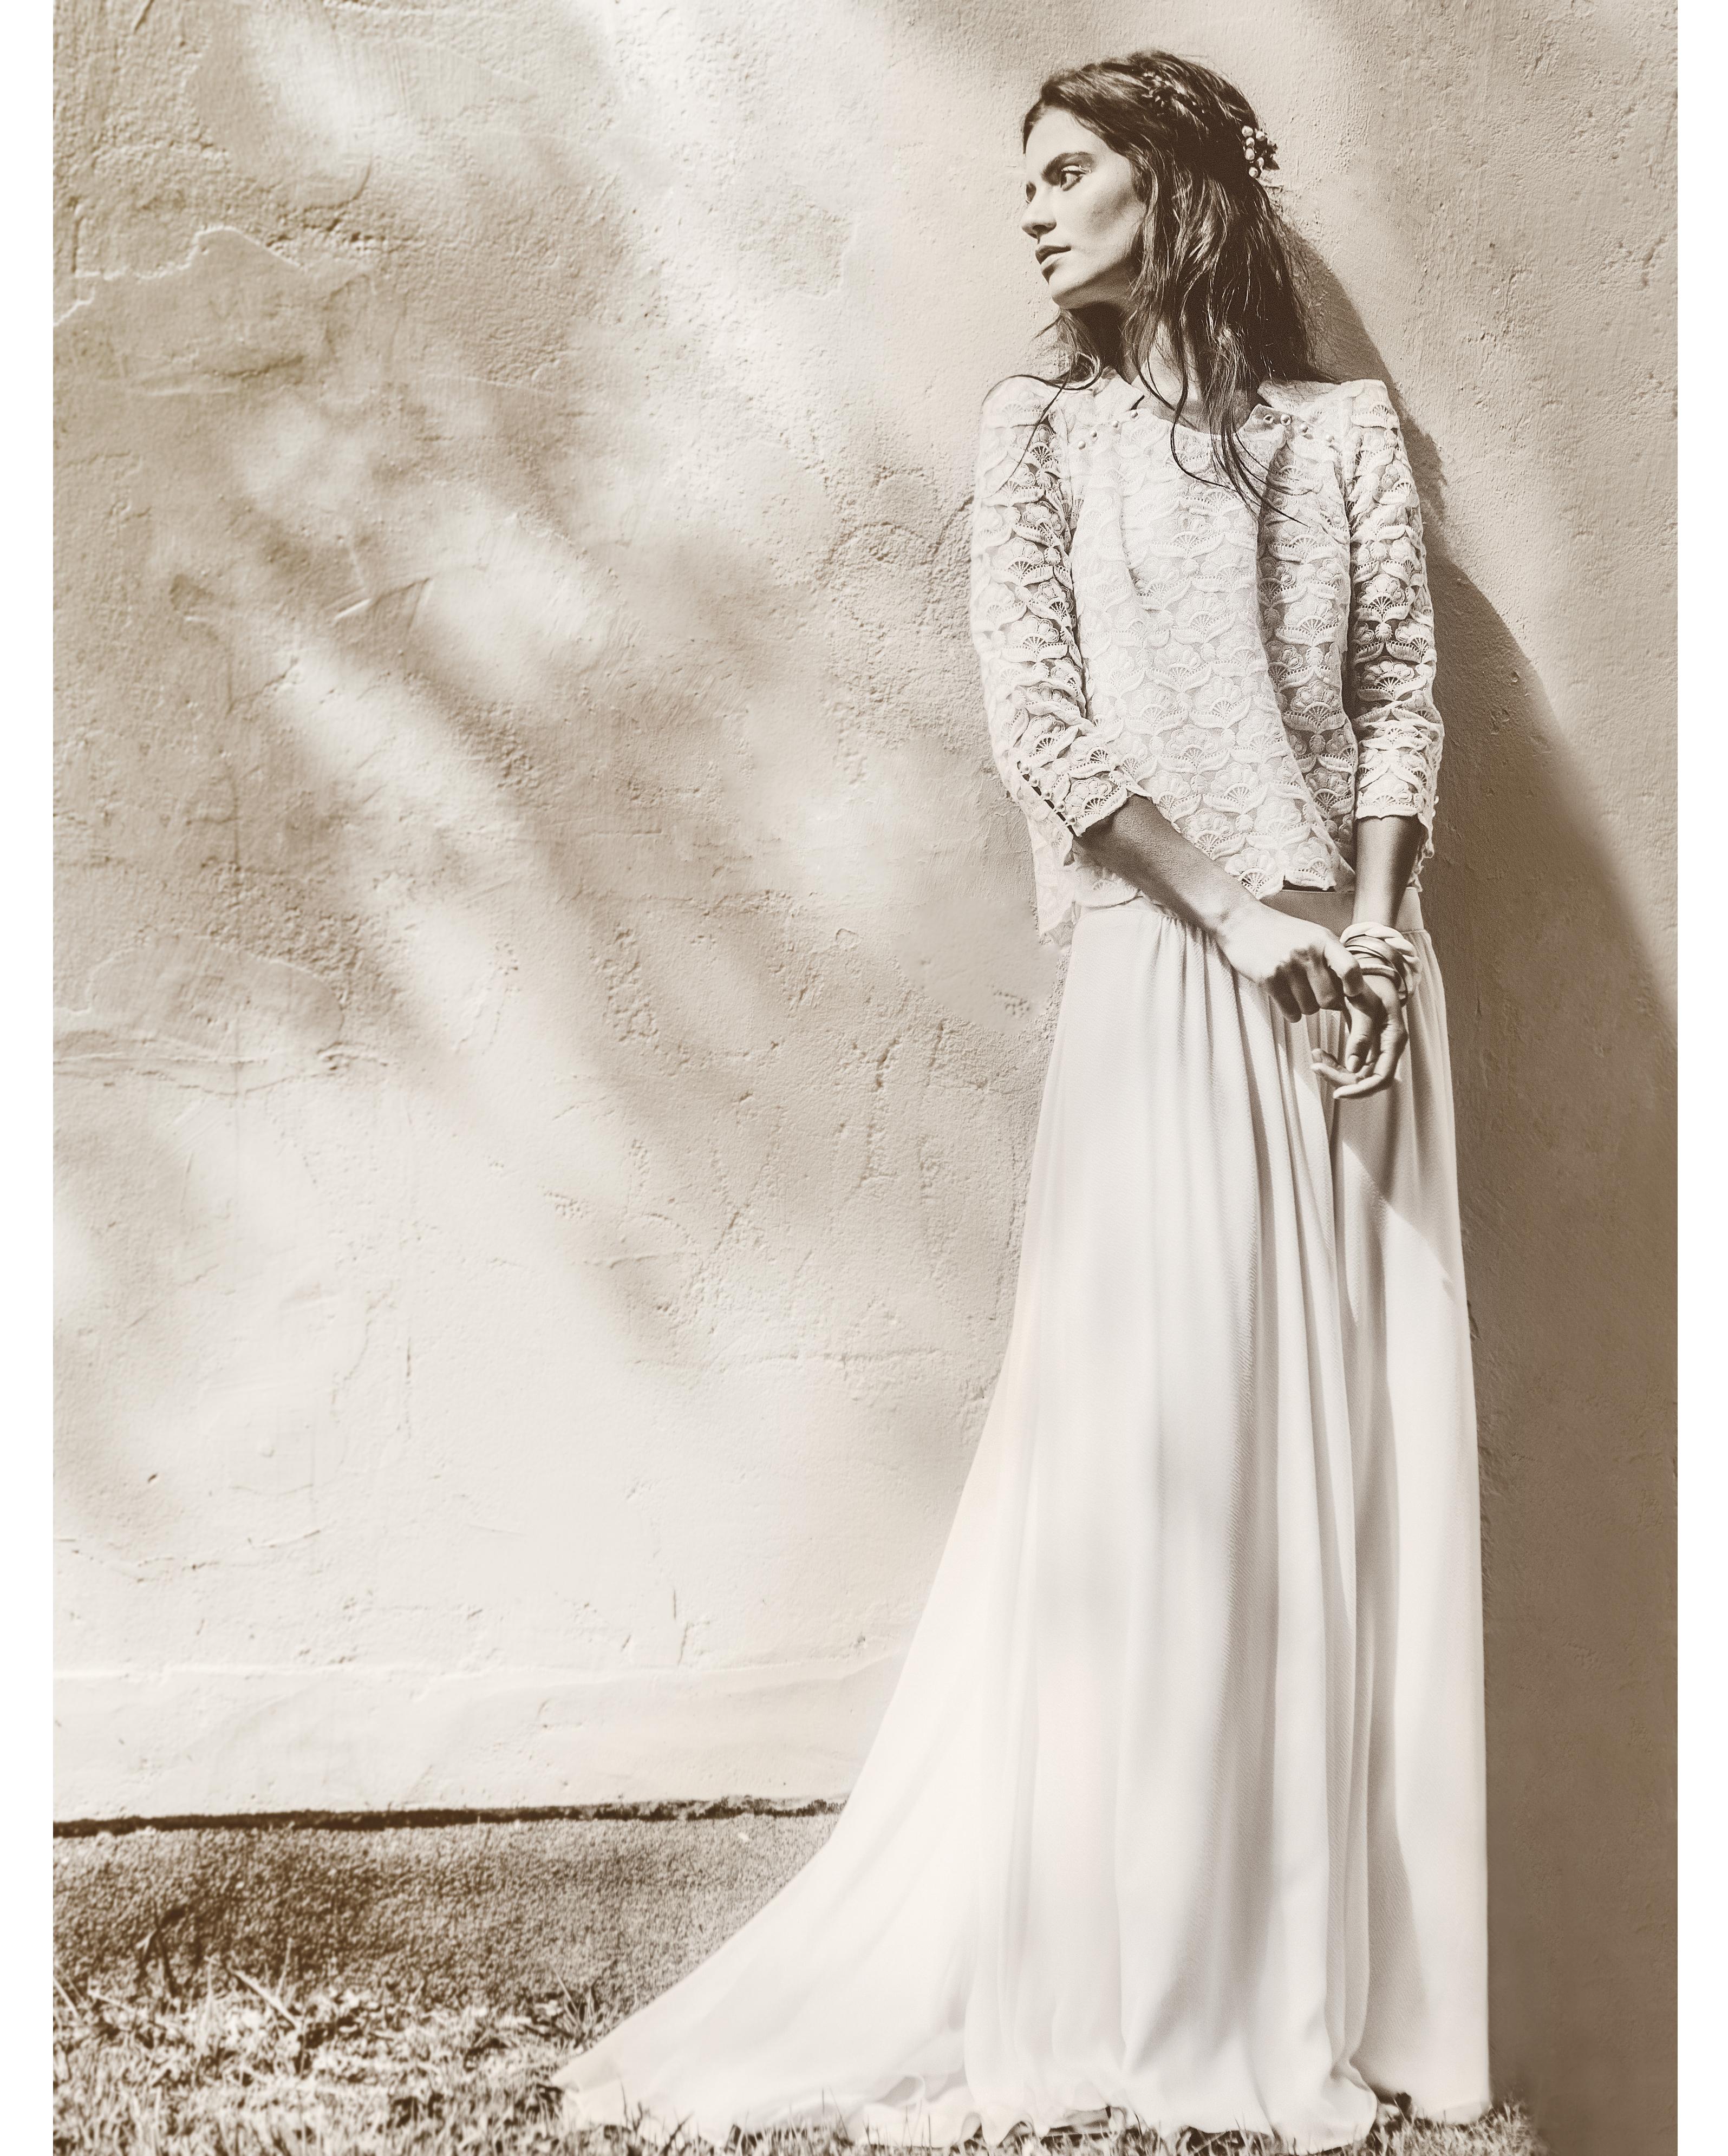 50-states-wedding-dresses-arizona-laure-desagazan-s112015.jpg